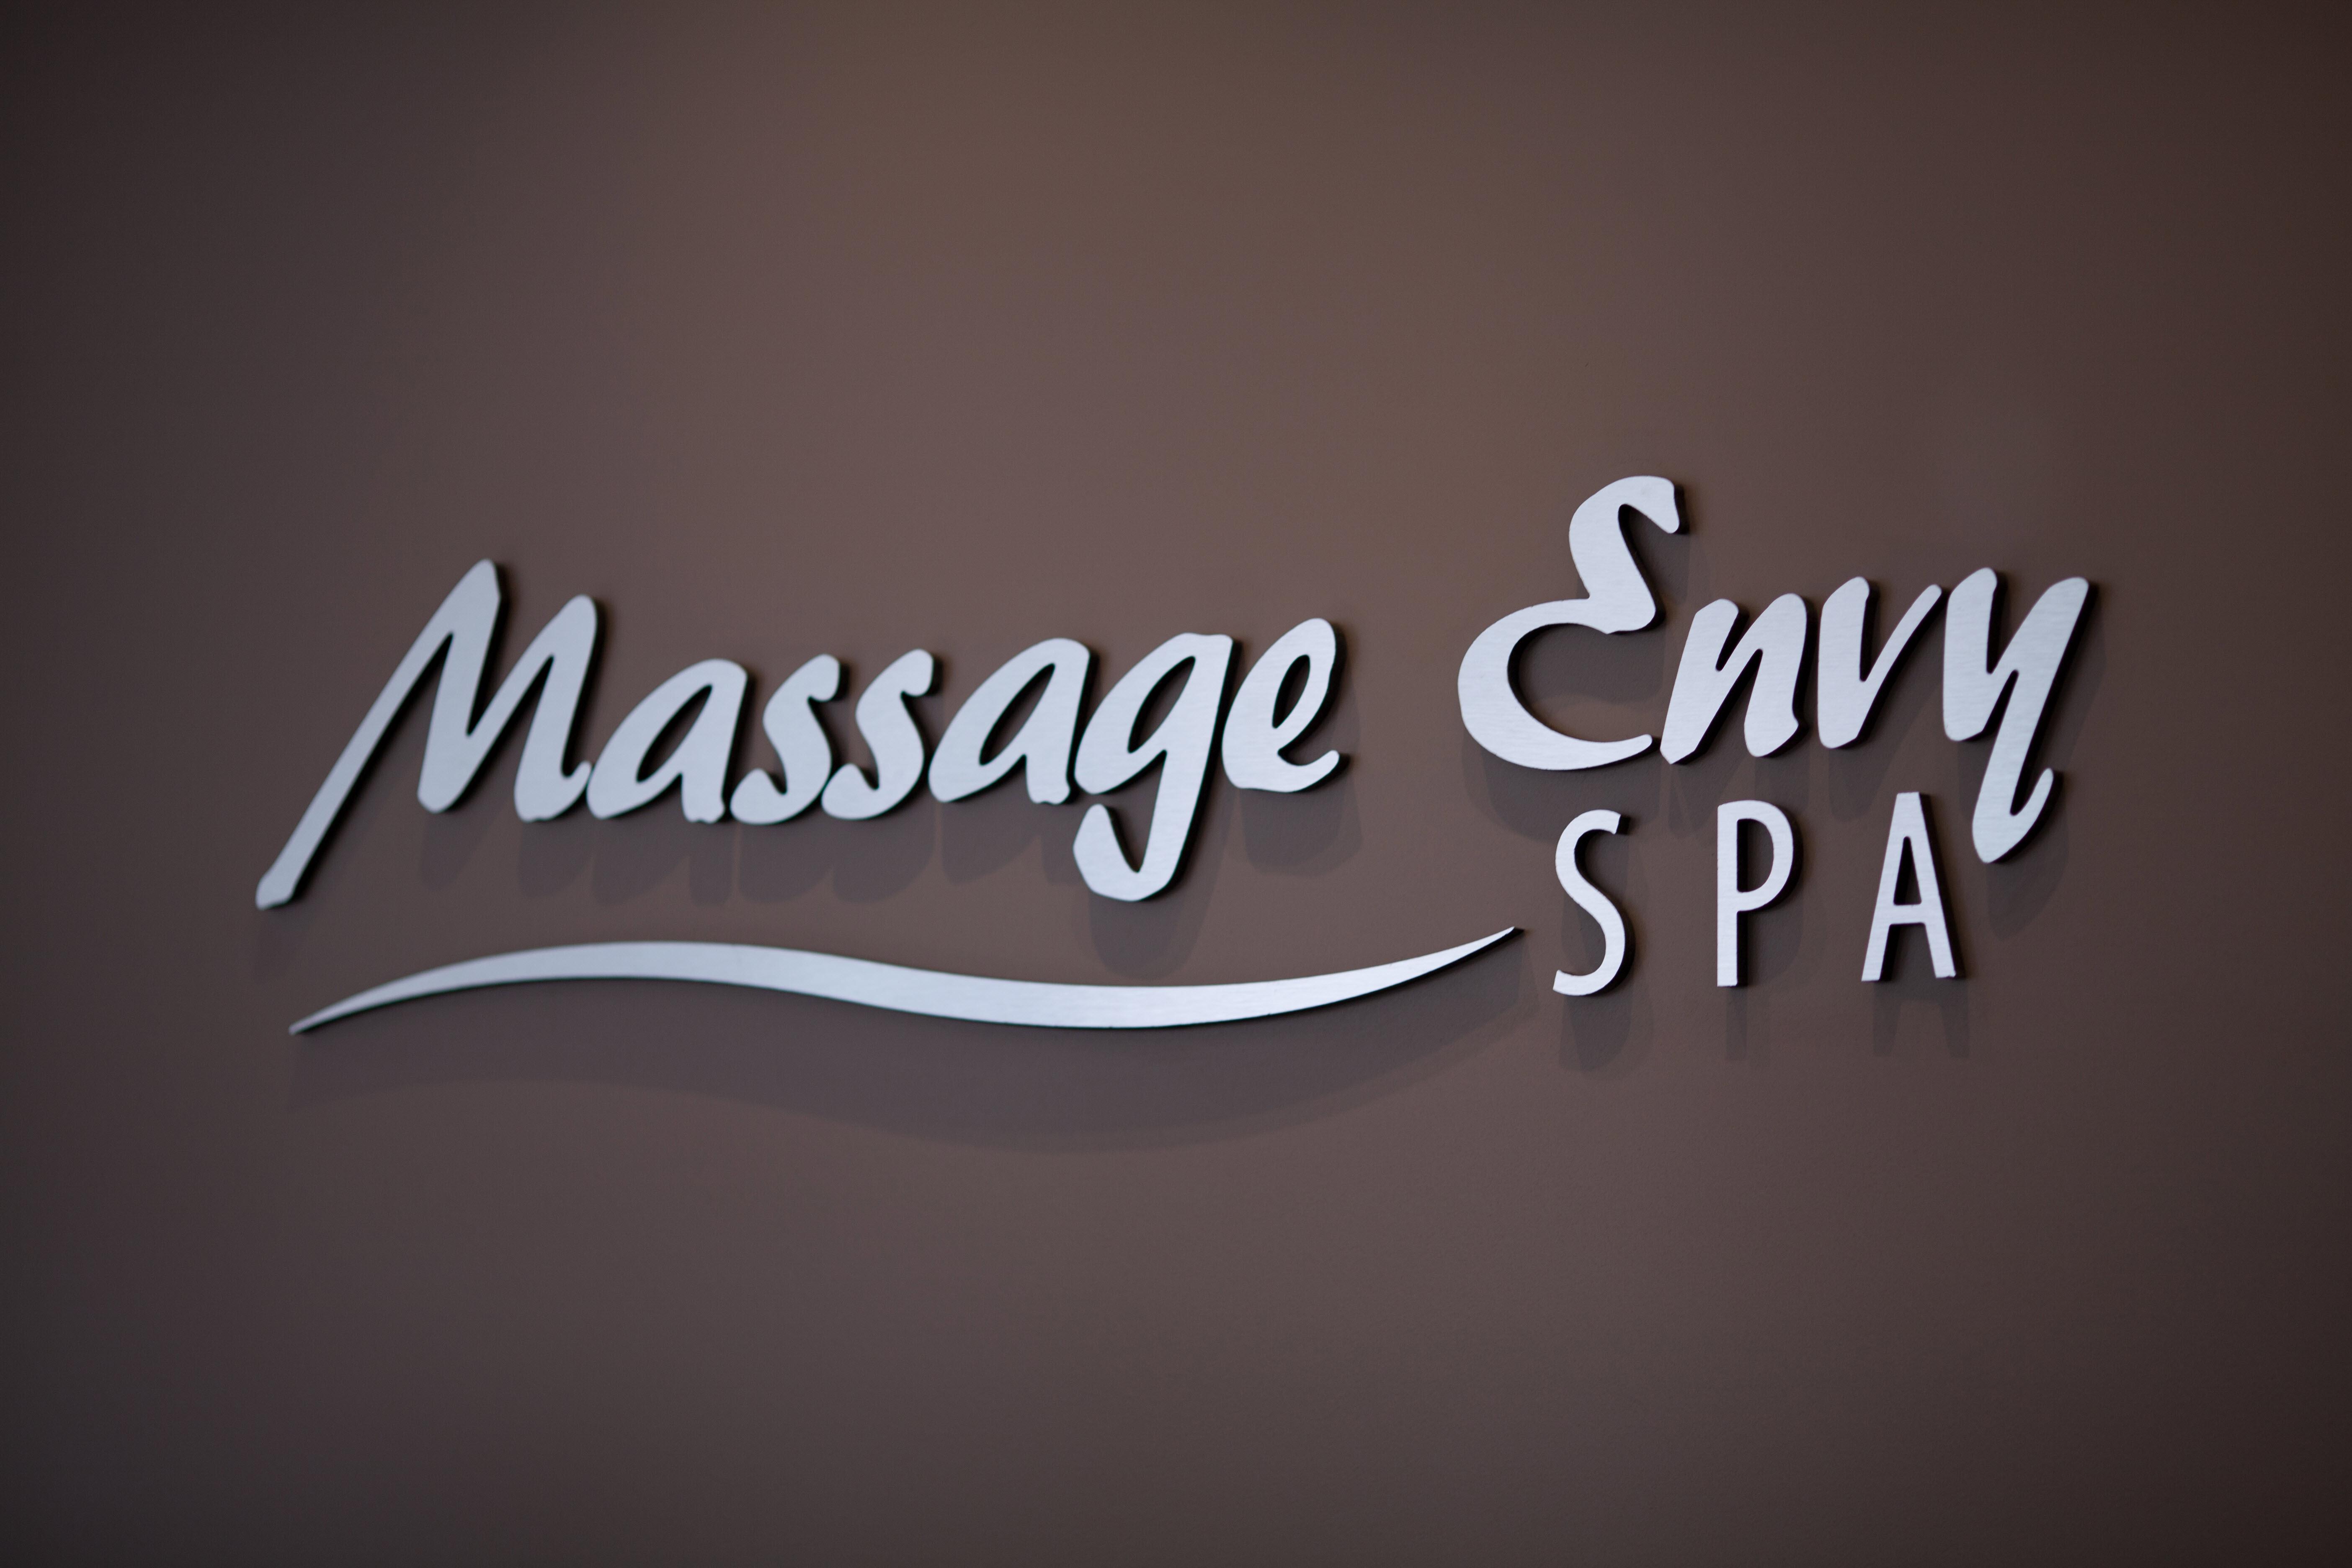 Massage Envy Spa - Imperial Oaks